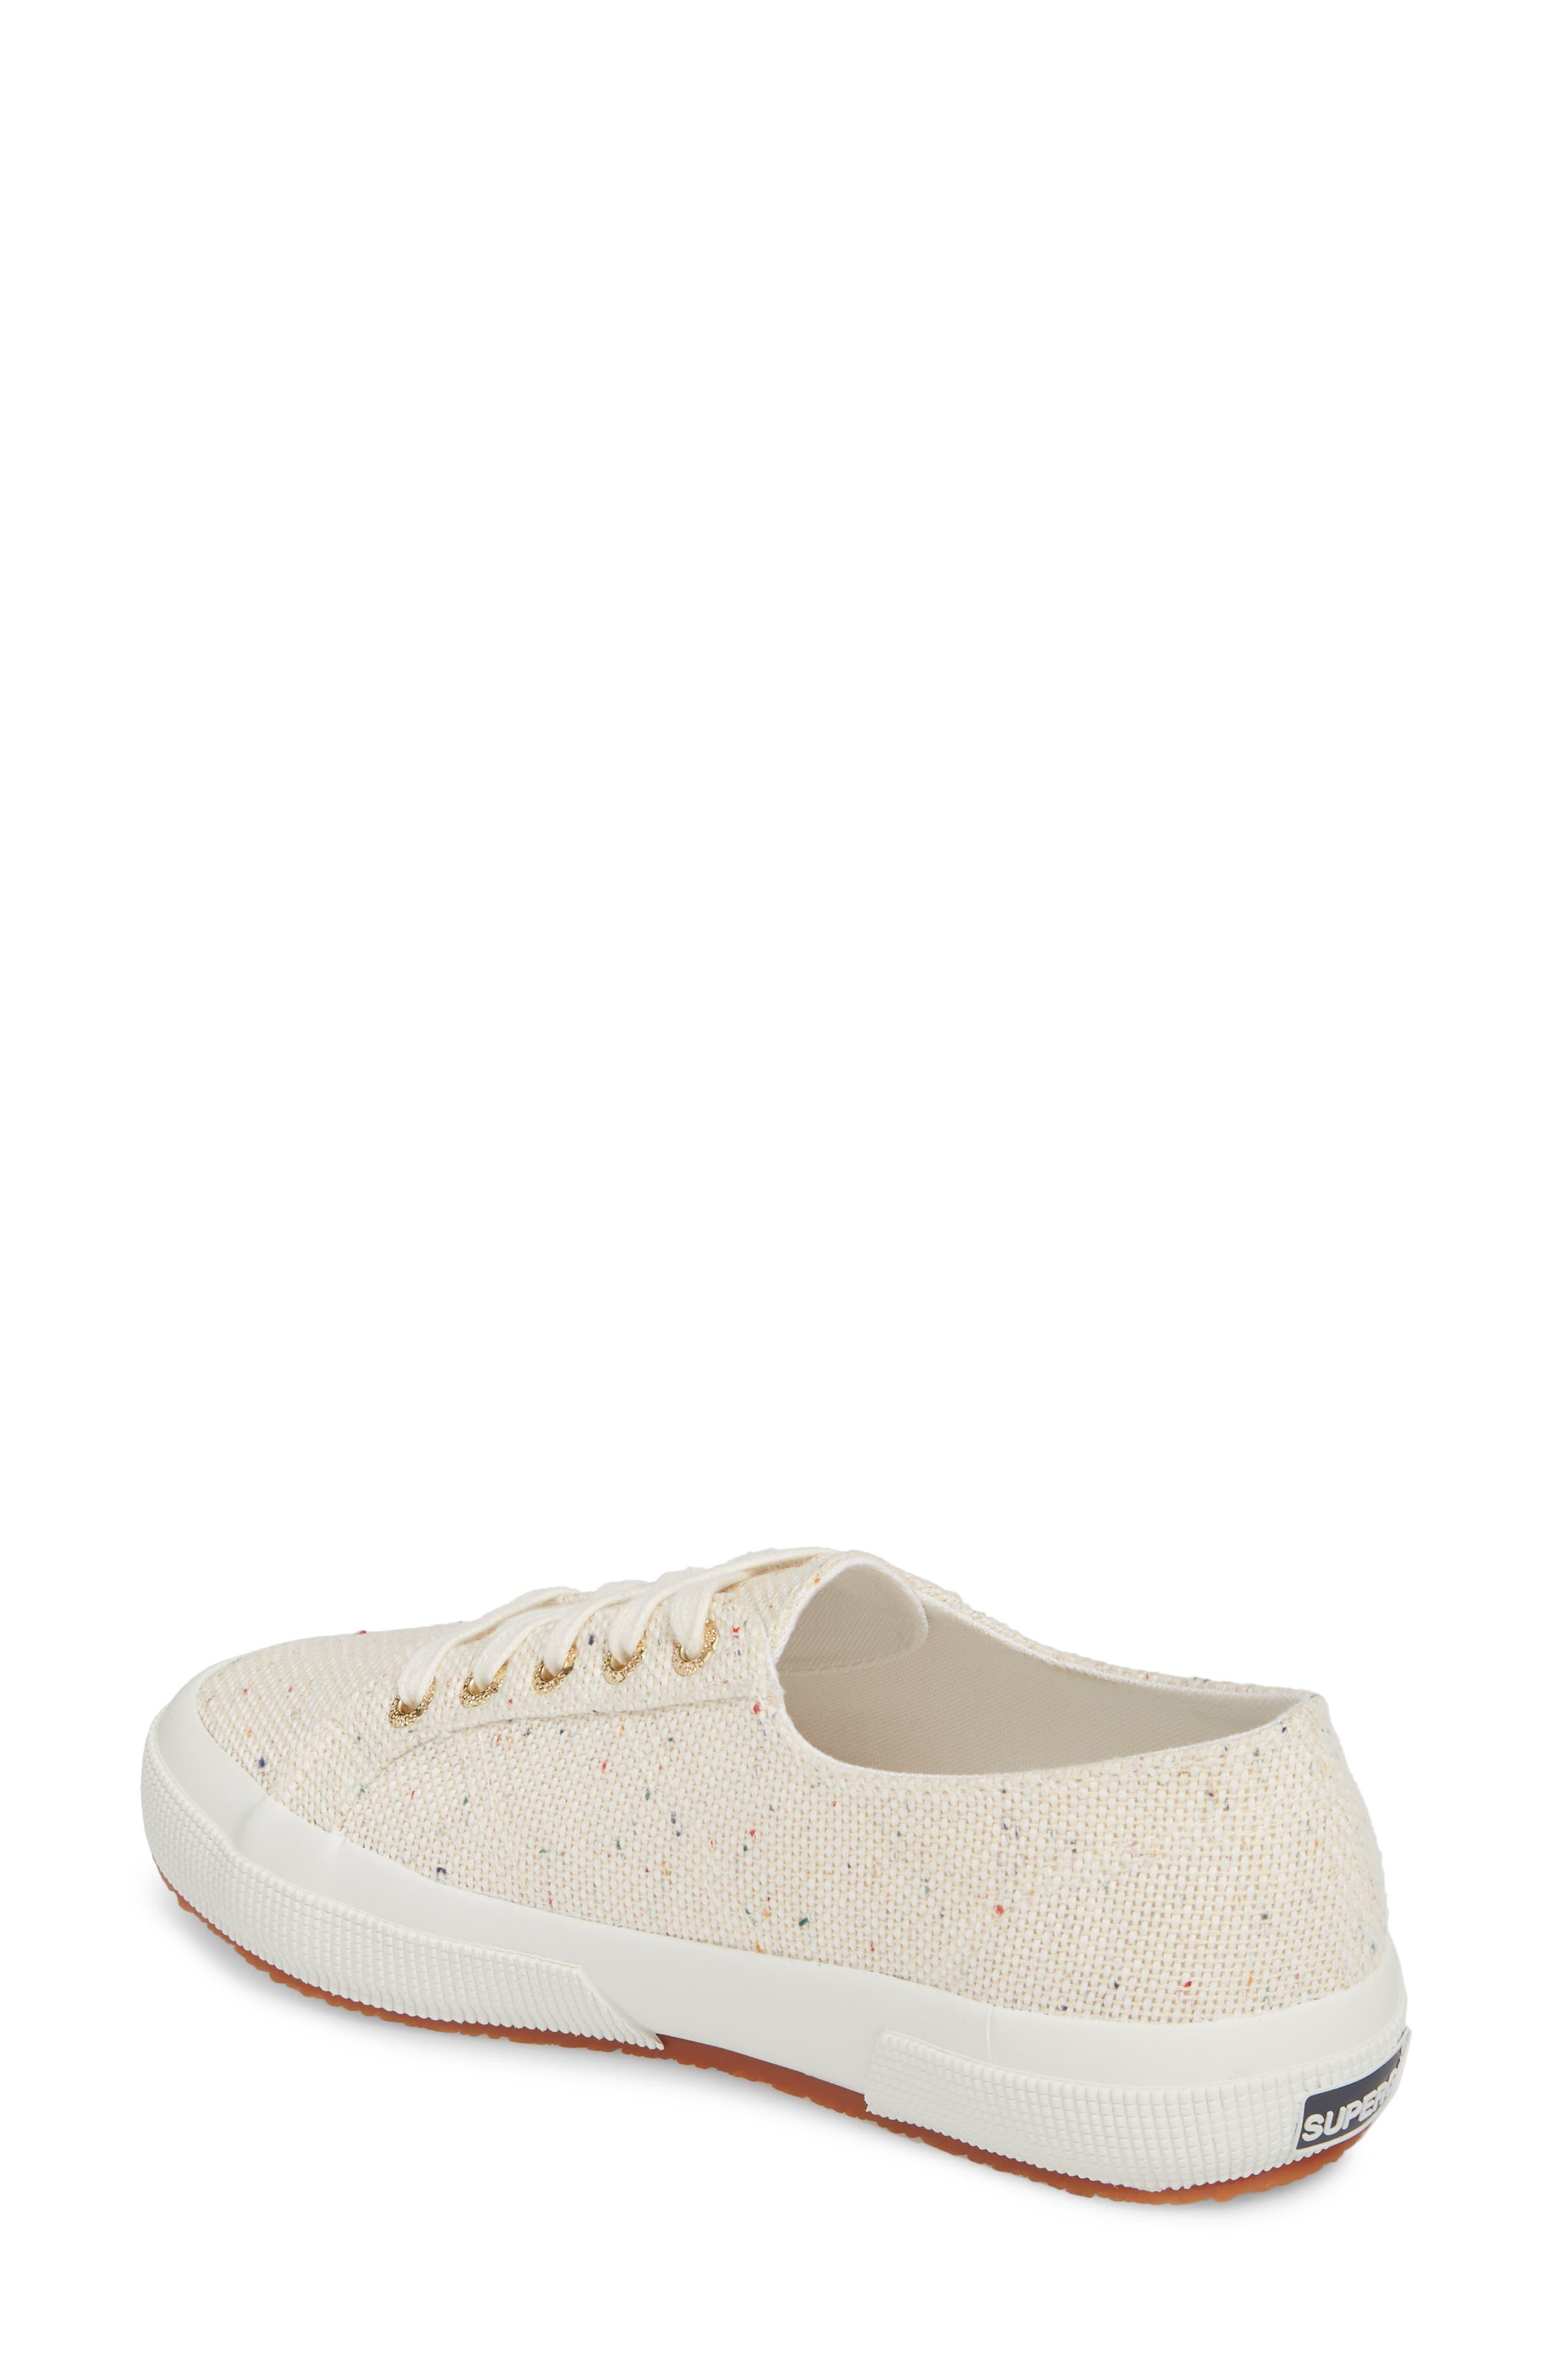 2750 Speckle Low Top Sneaker,                             Alternate thumbnail 2, color,                             White Multi